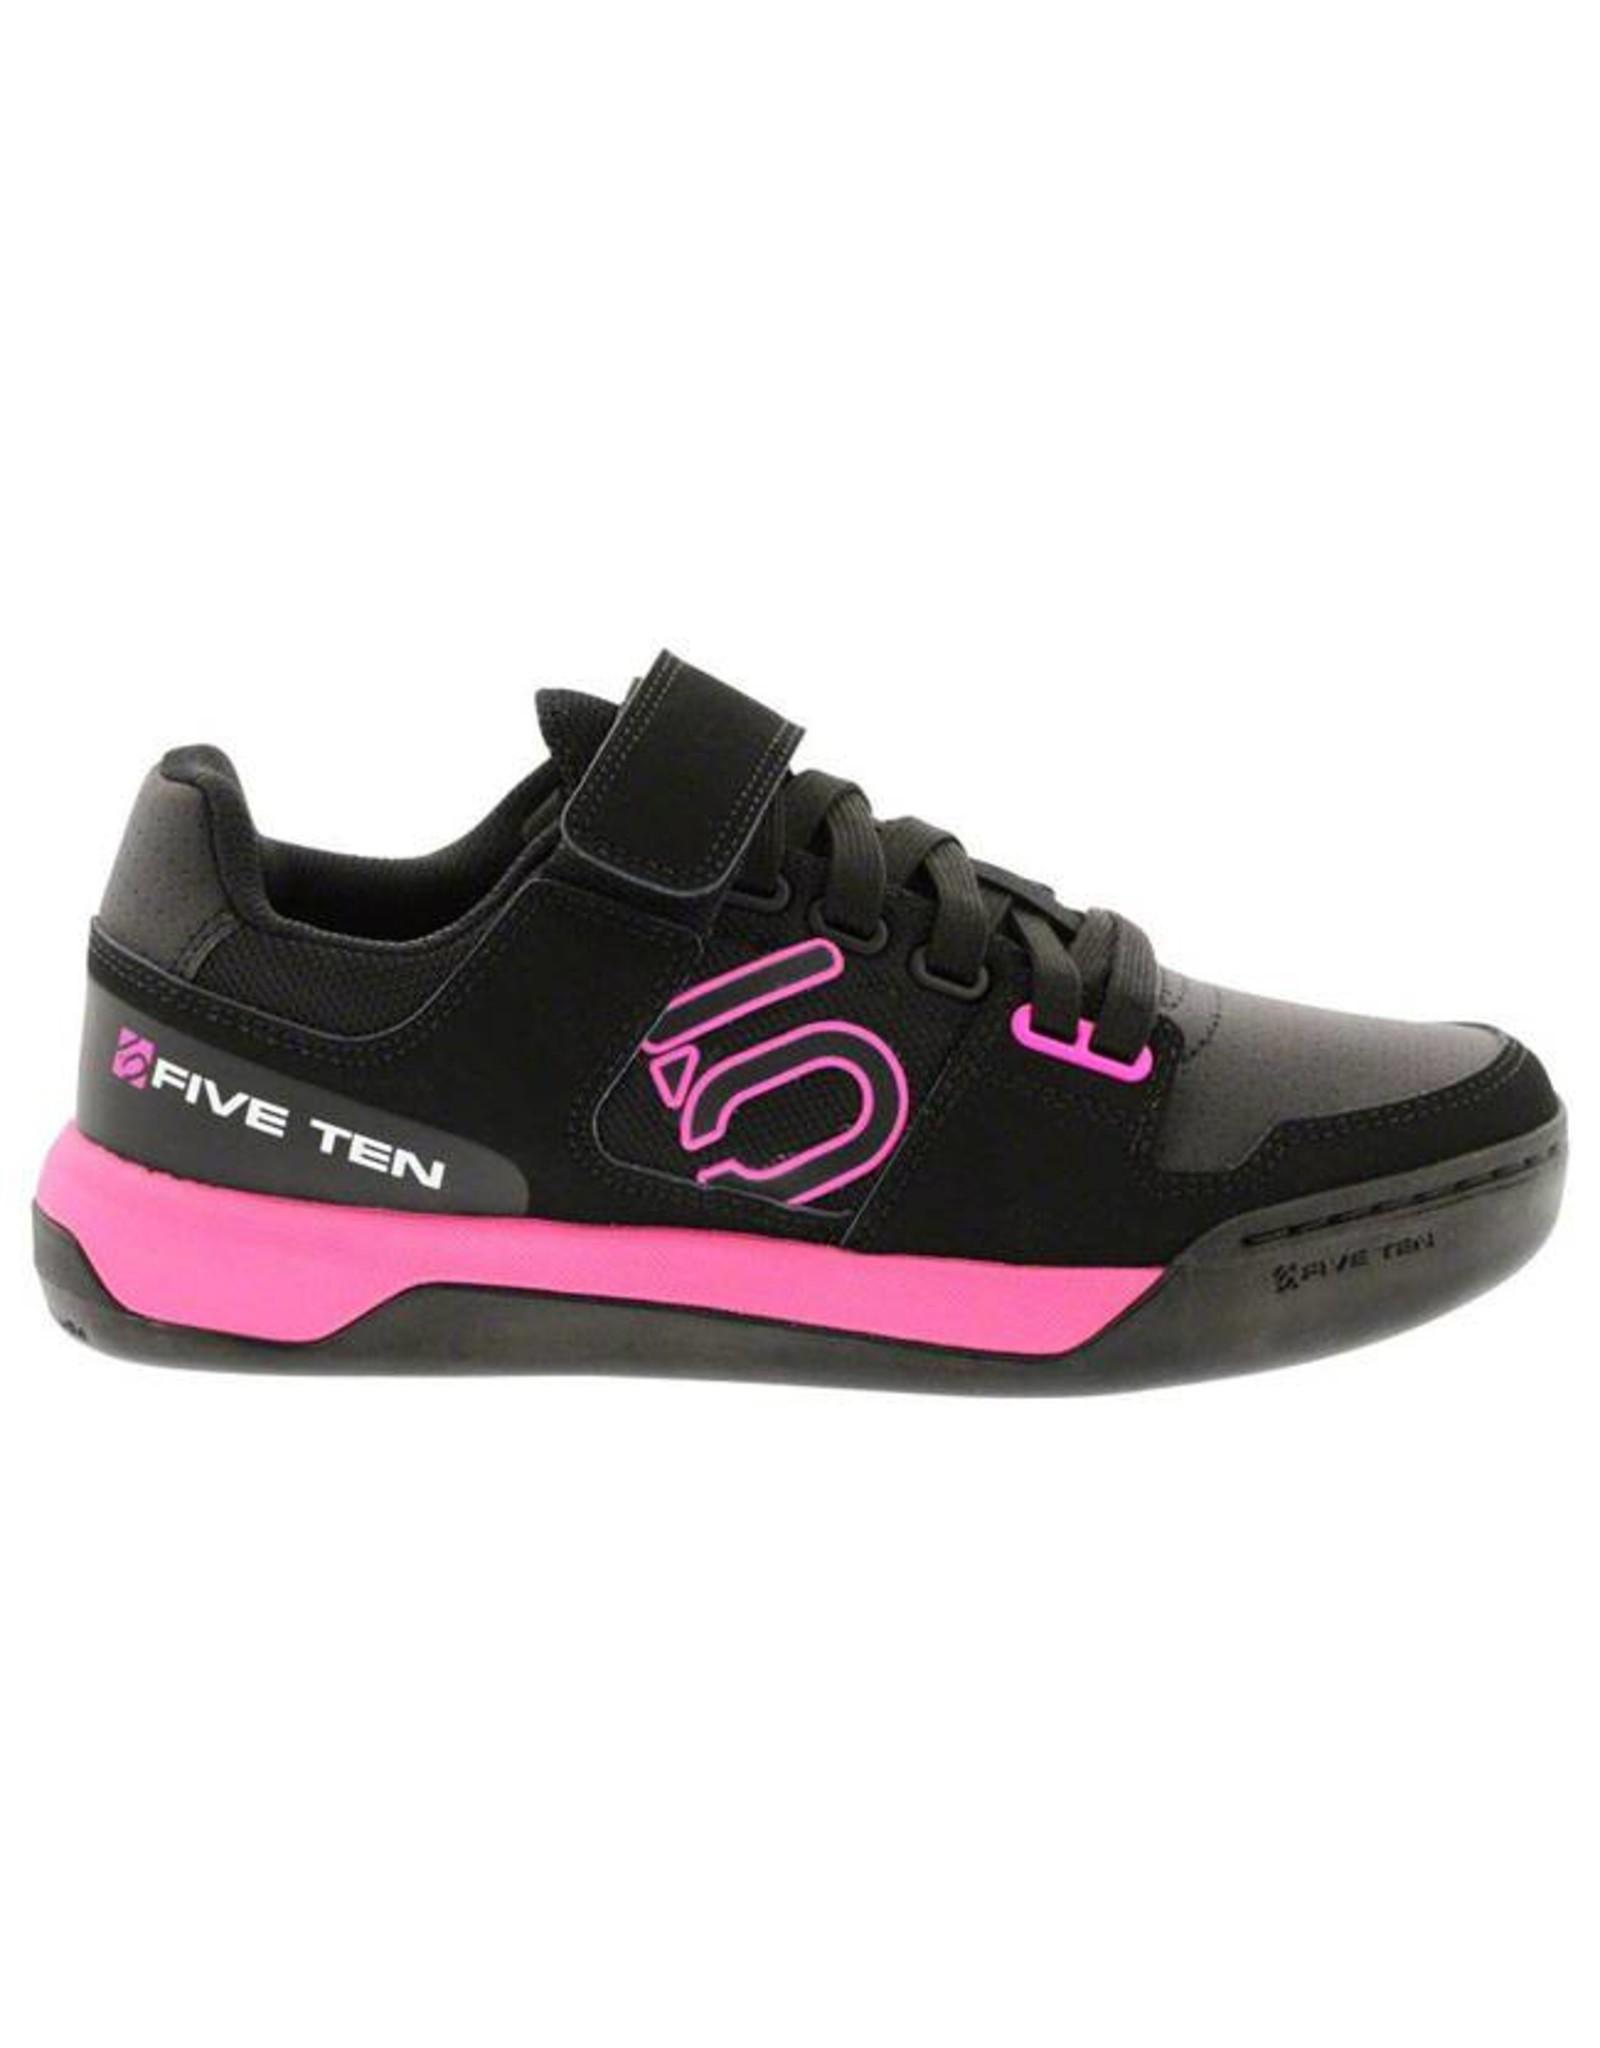 Five Ten Five Ten Hellcat Women's Clipless/Flat Pedal Shoe: Shock Pink 9